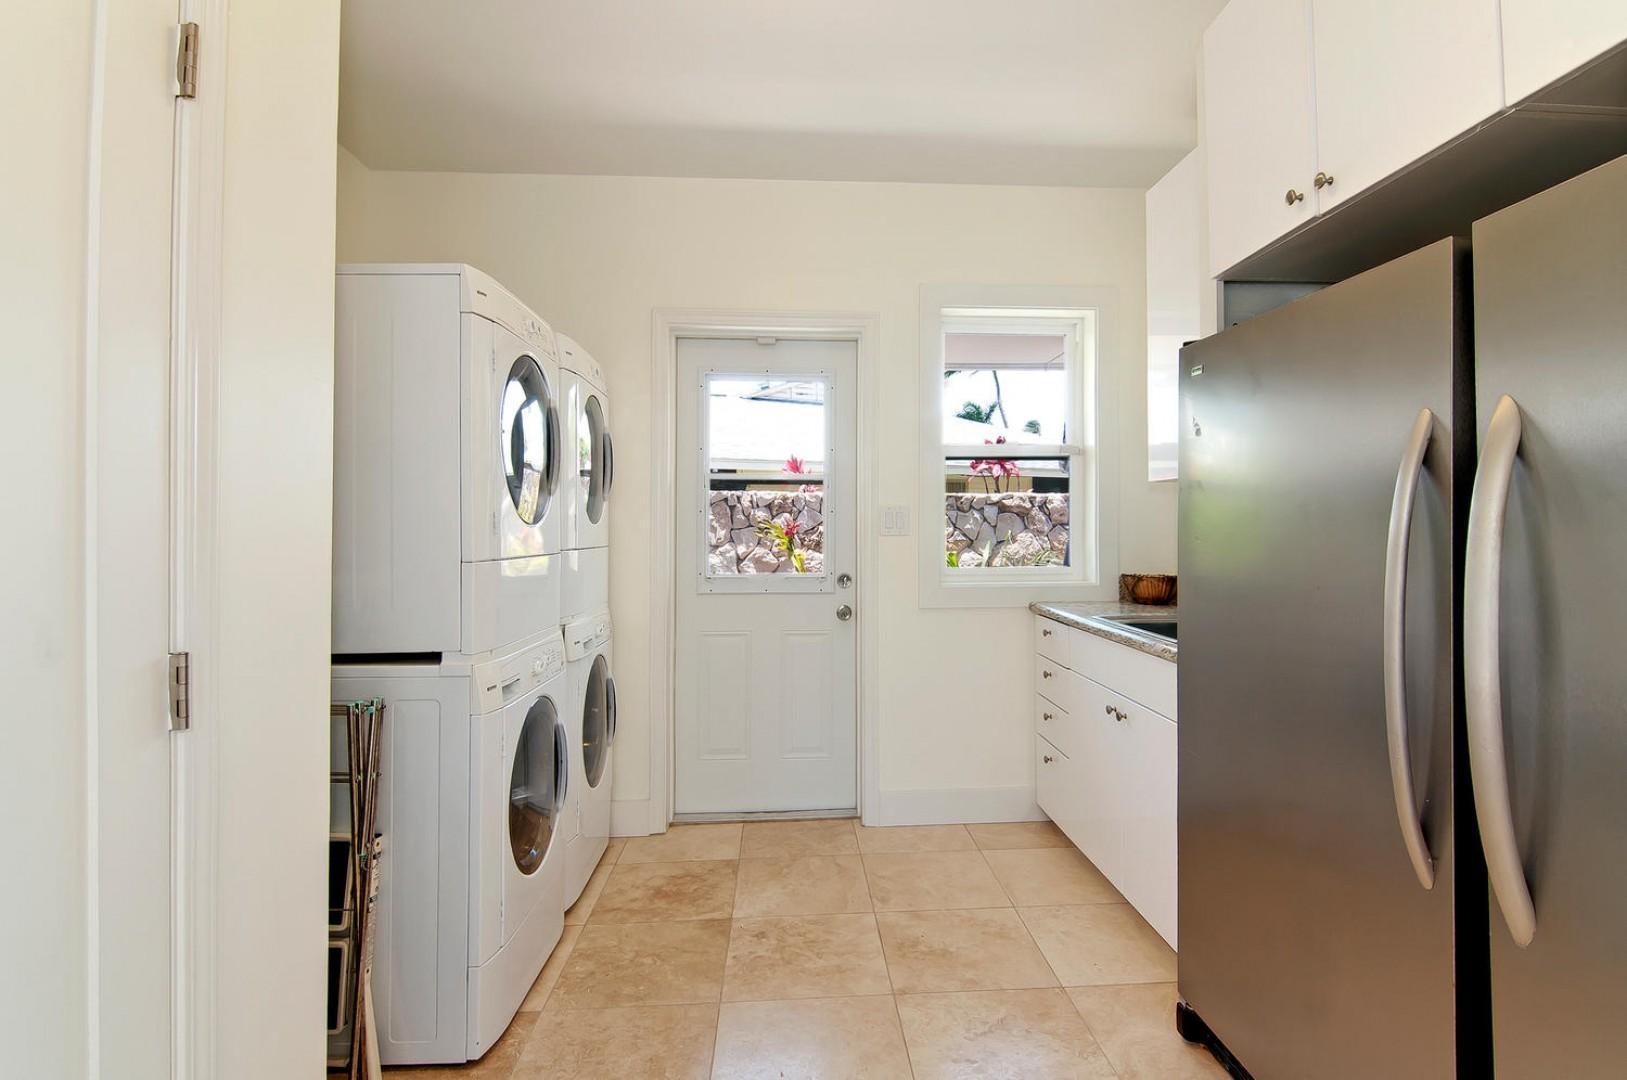 Laundry room - Two washers, two dryers, extra full fridge and full freezer